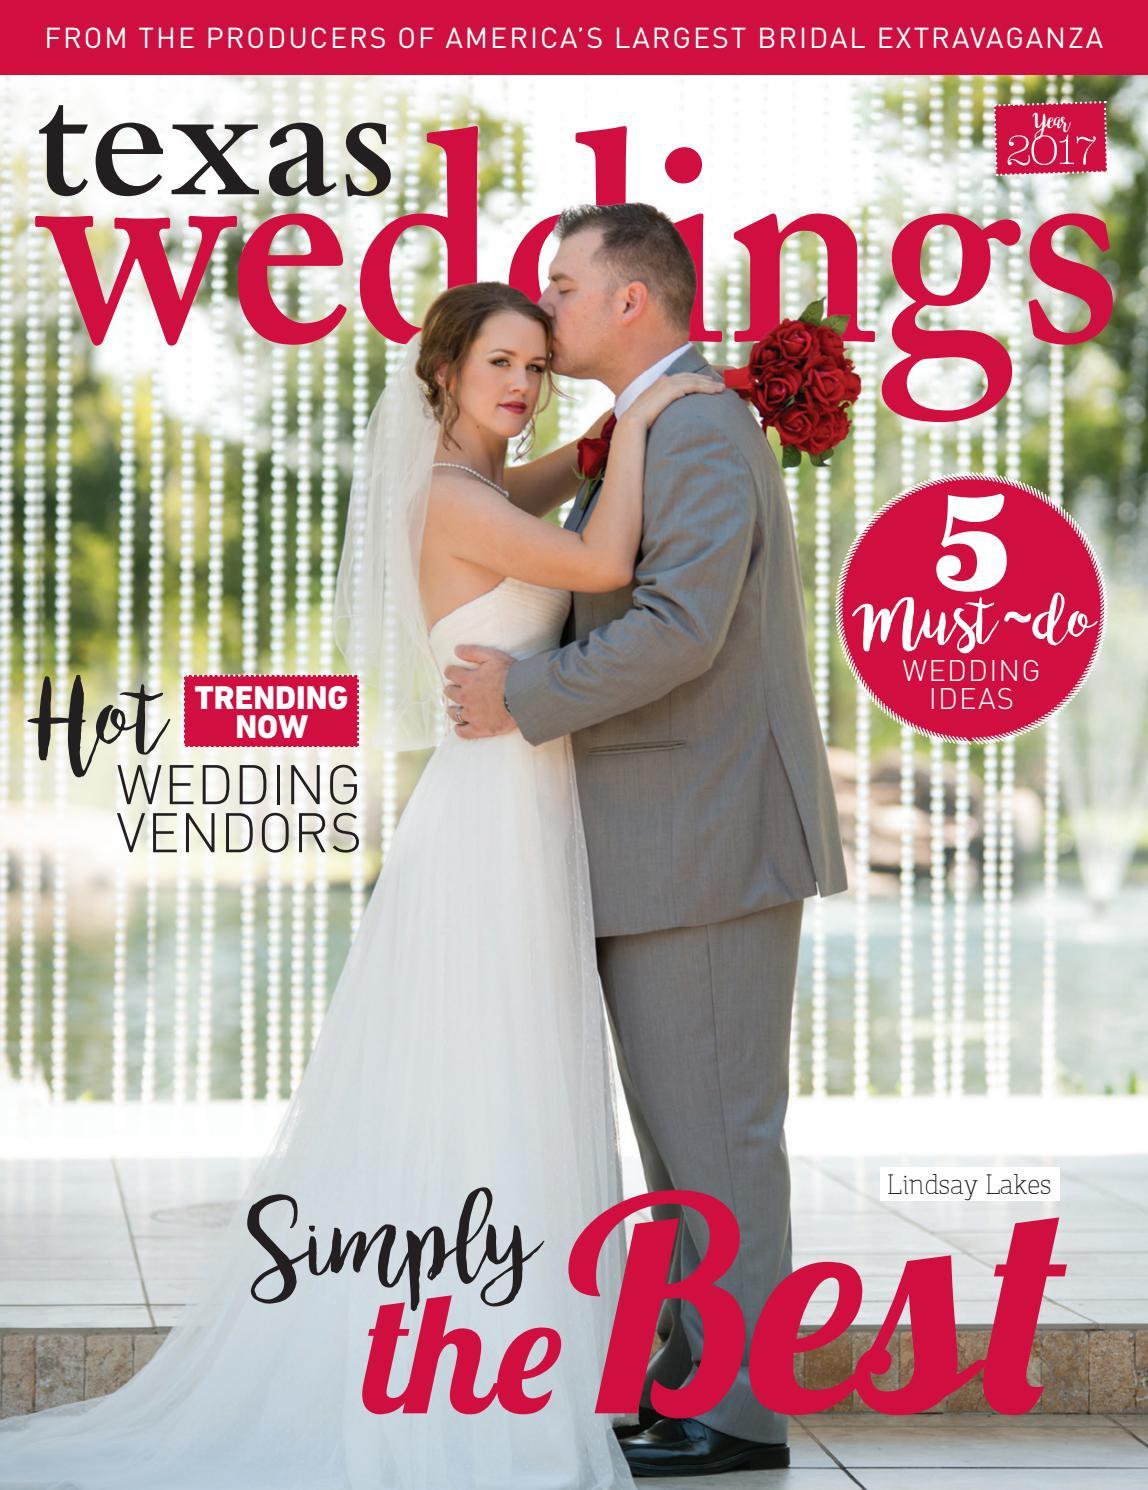 6bb67d77edfd Lindsay Lakes on Texas Weddings by Bridal Extravaganza Show Houston ...